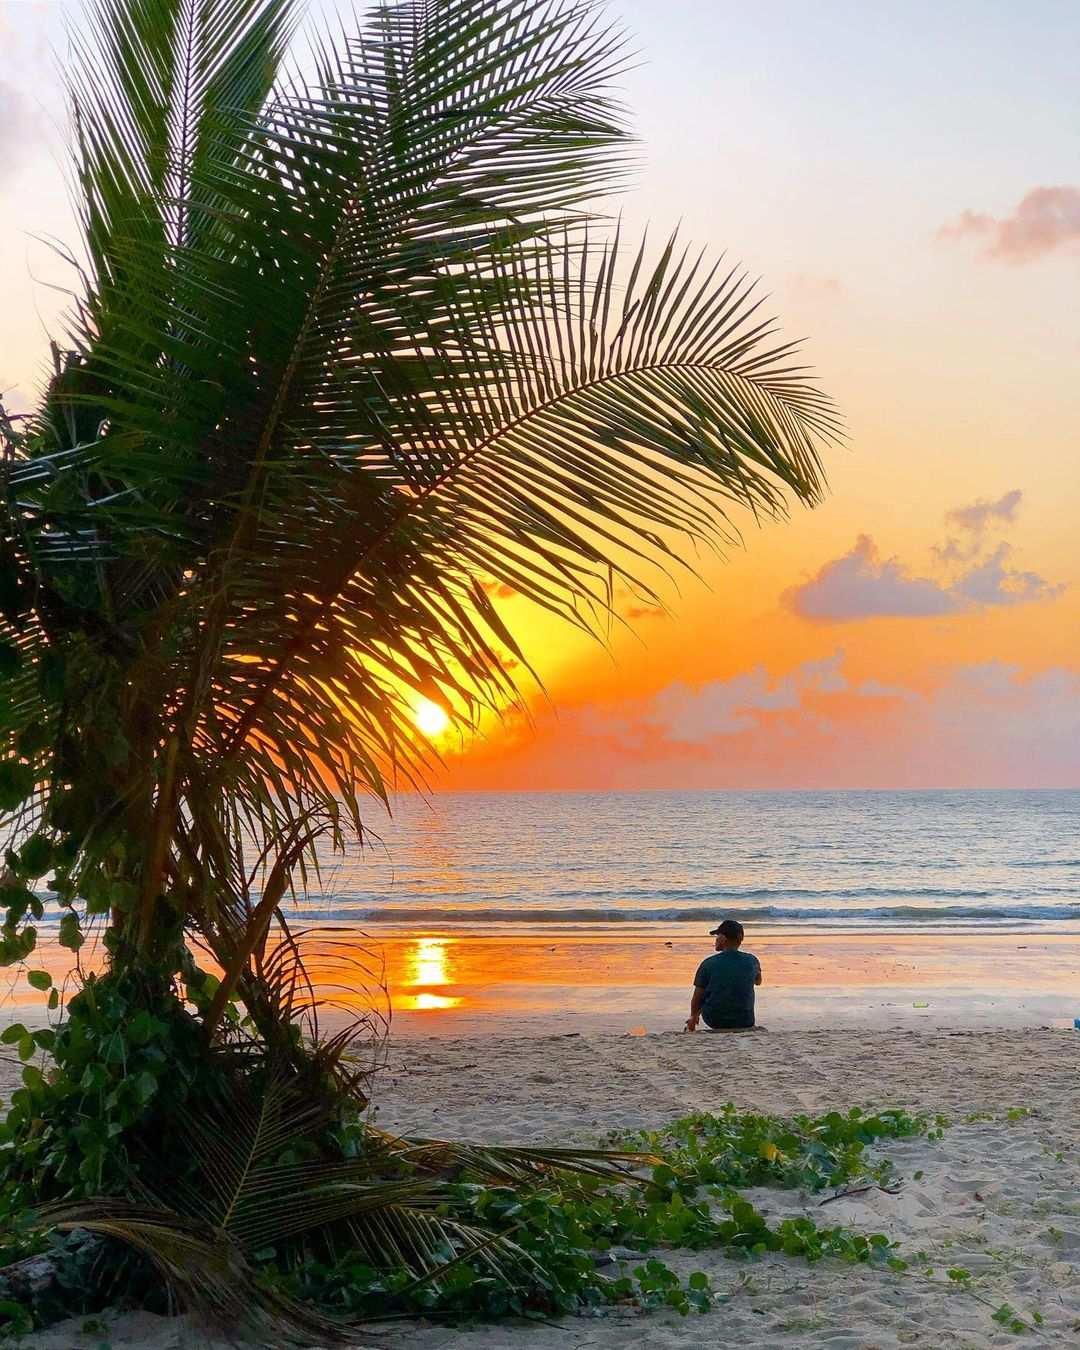 Sunset at Sirinat National Park on Phuket